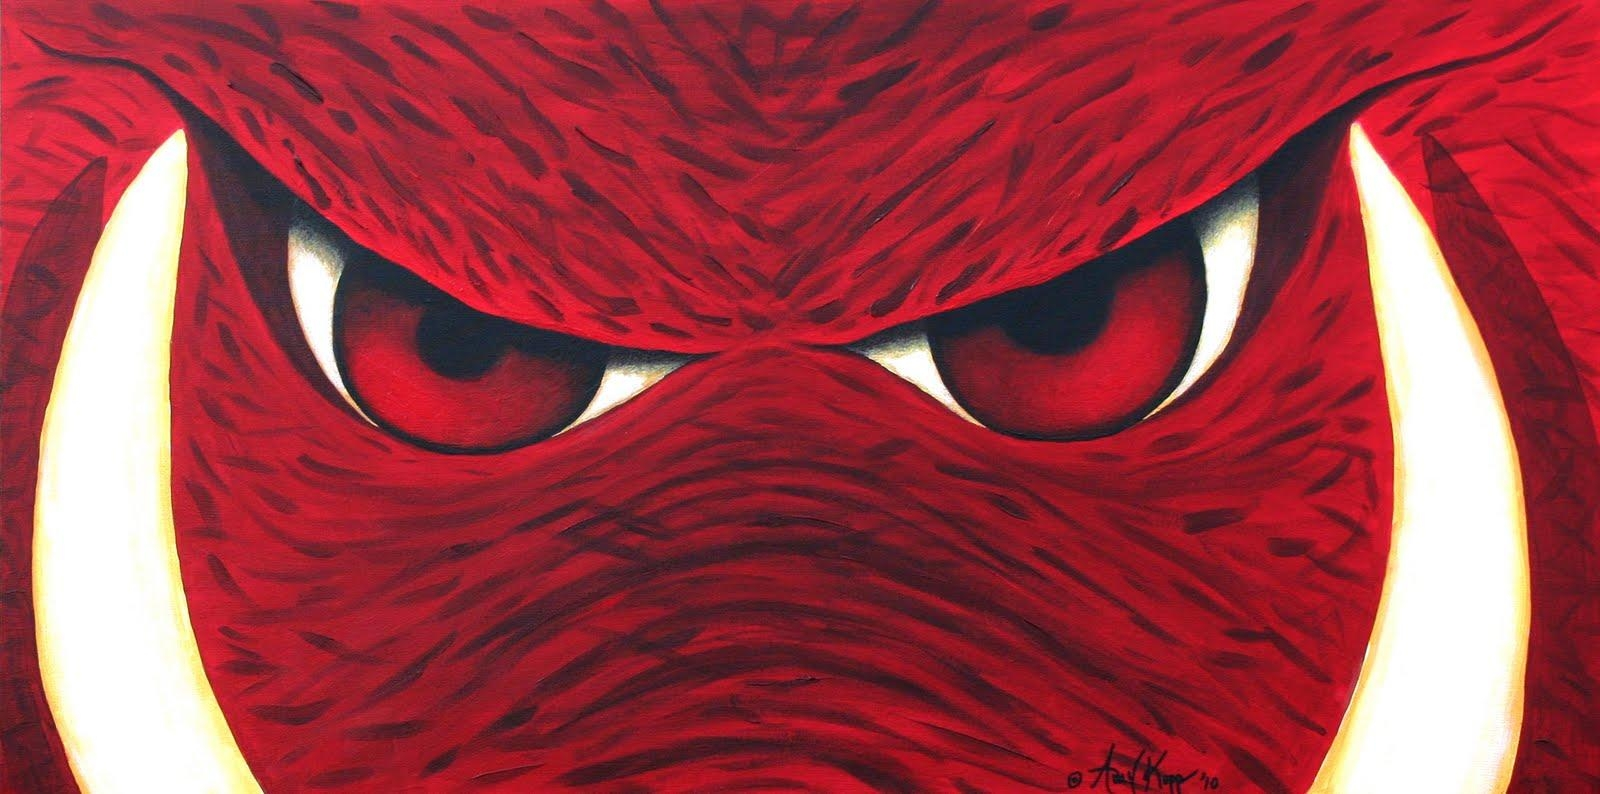 My Journey Creating: Arkansas Razorbacks Wall Art For Razorback Wall Art (Image 14 of 20)